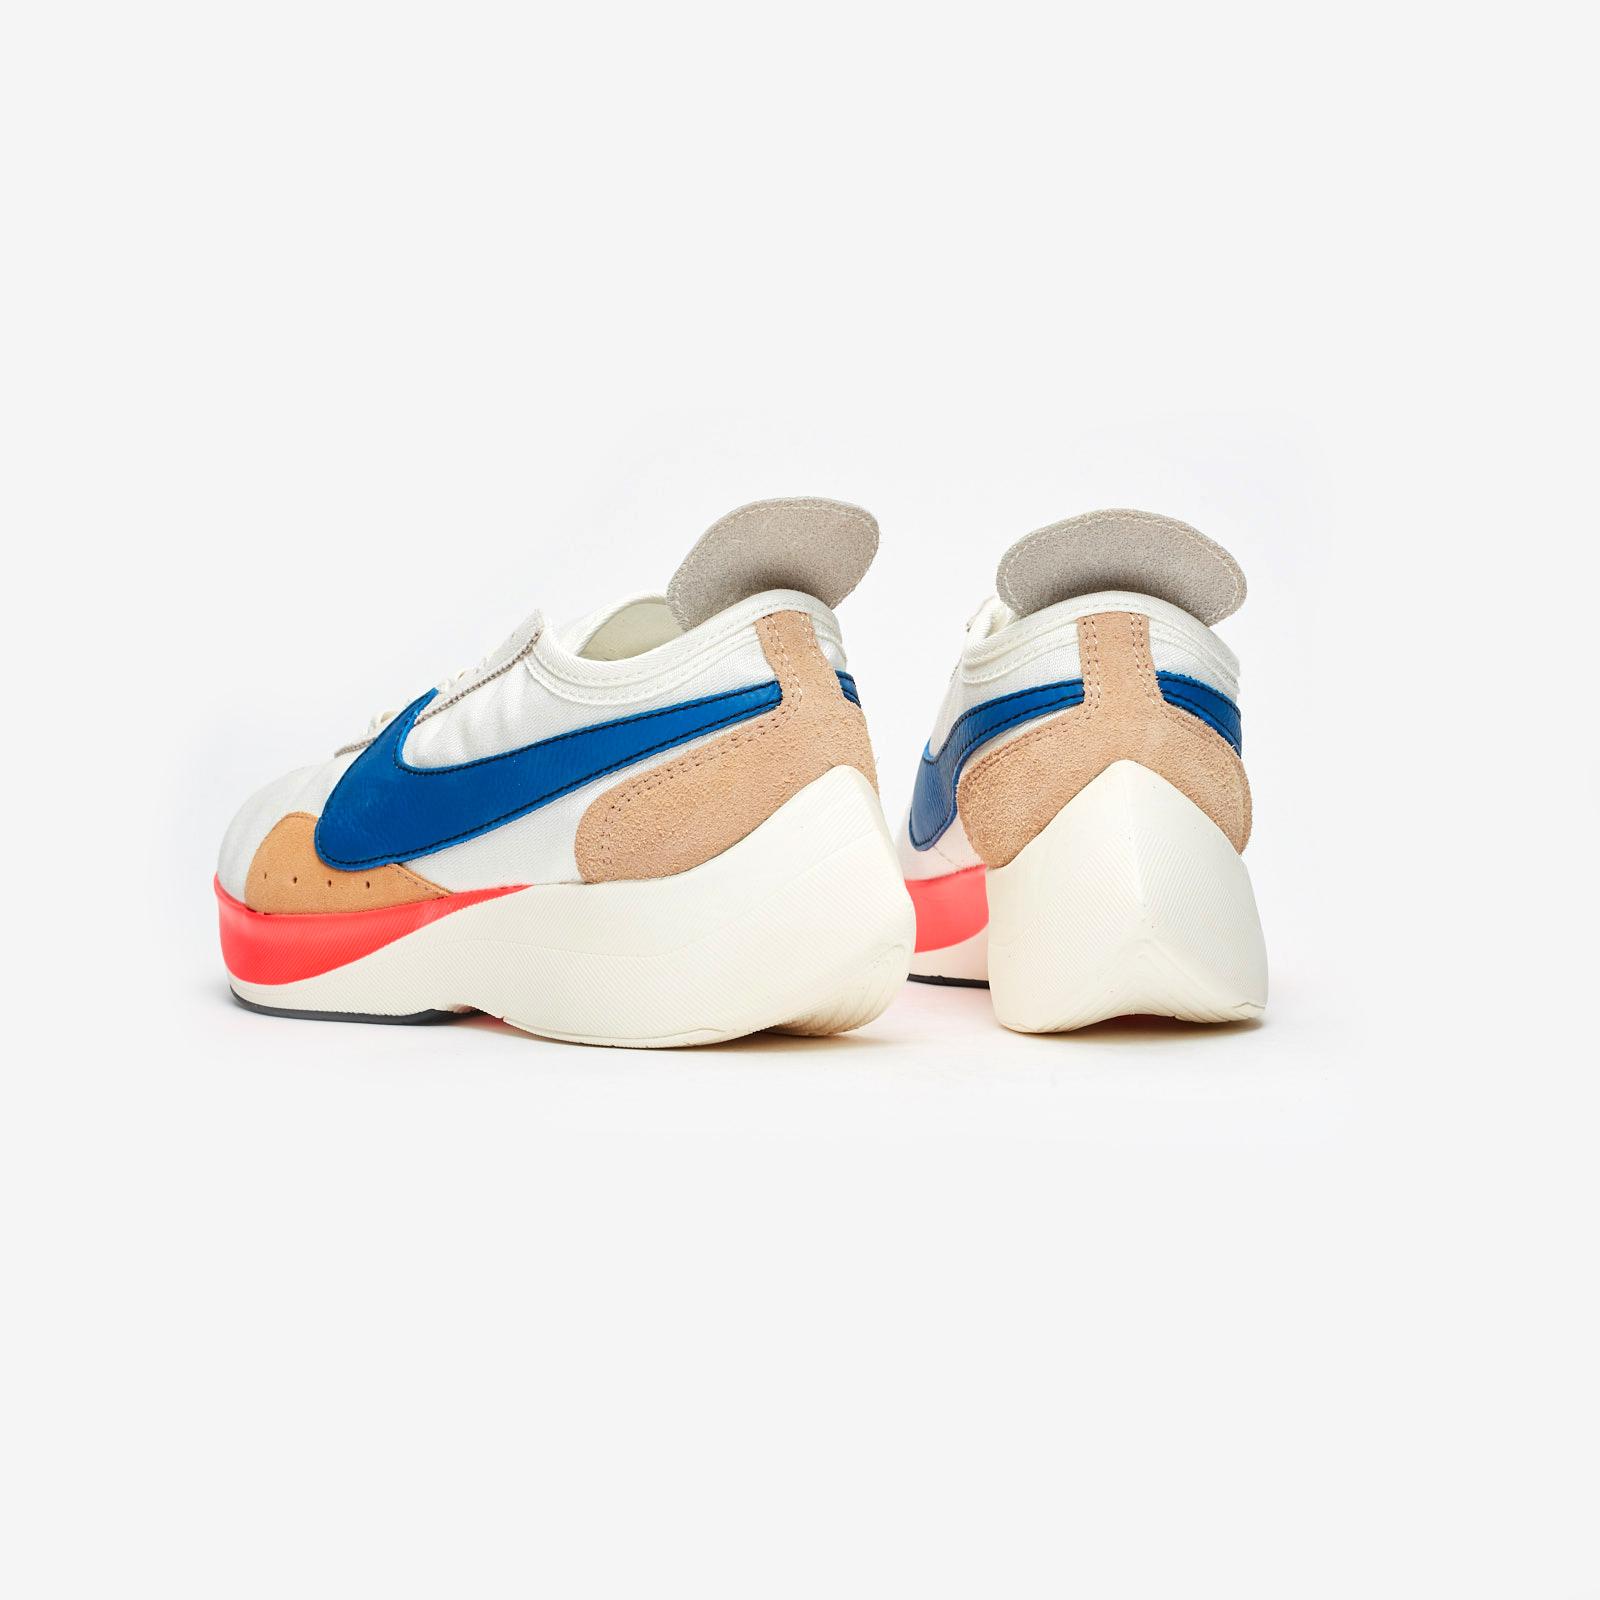 a3522c94fa5 Nike Sportswear Moon Racer QS Nike Sportswear Moon Racer QS ...